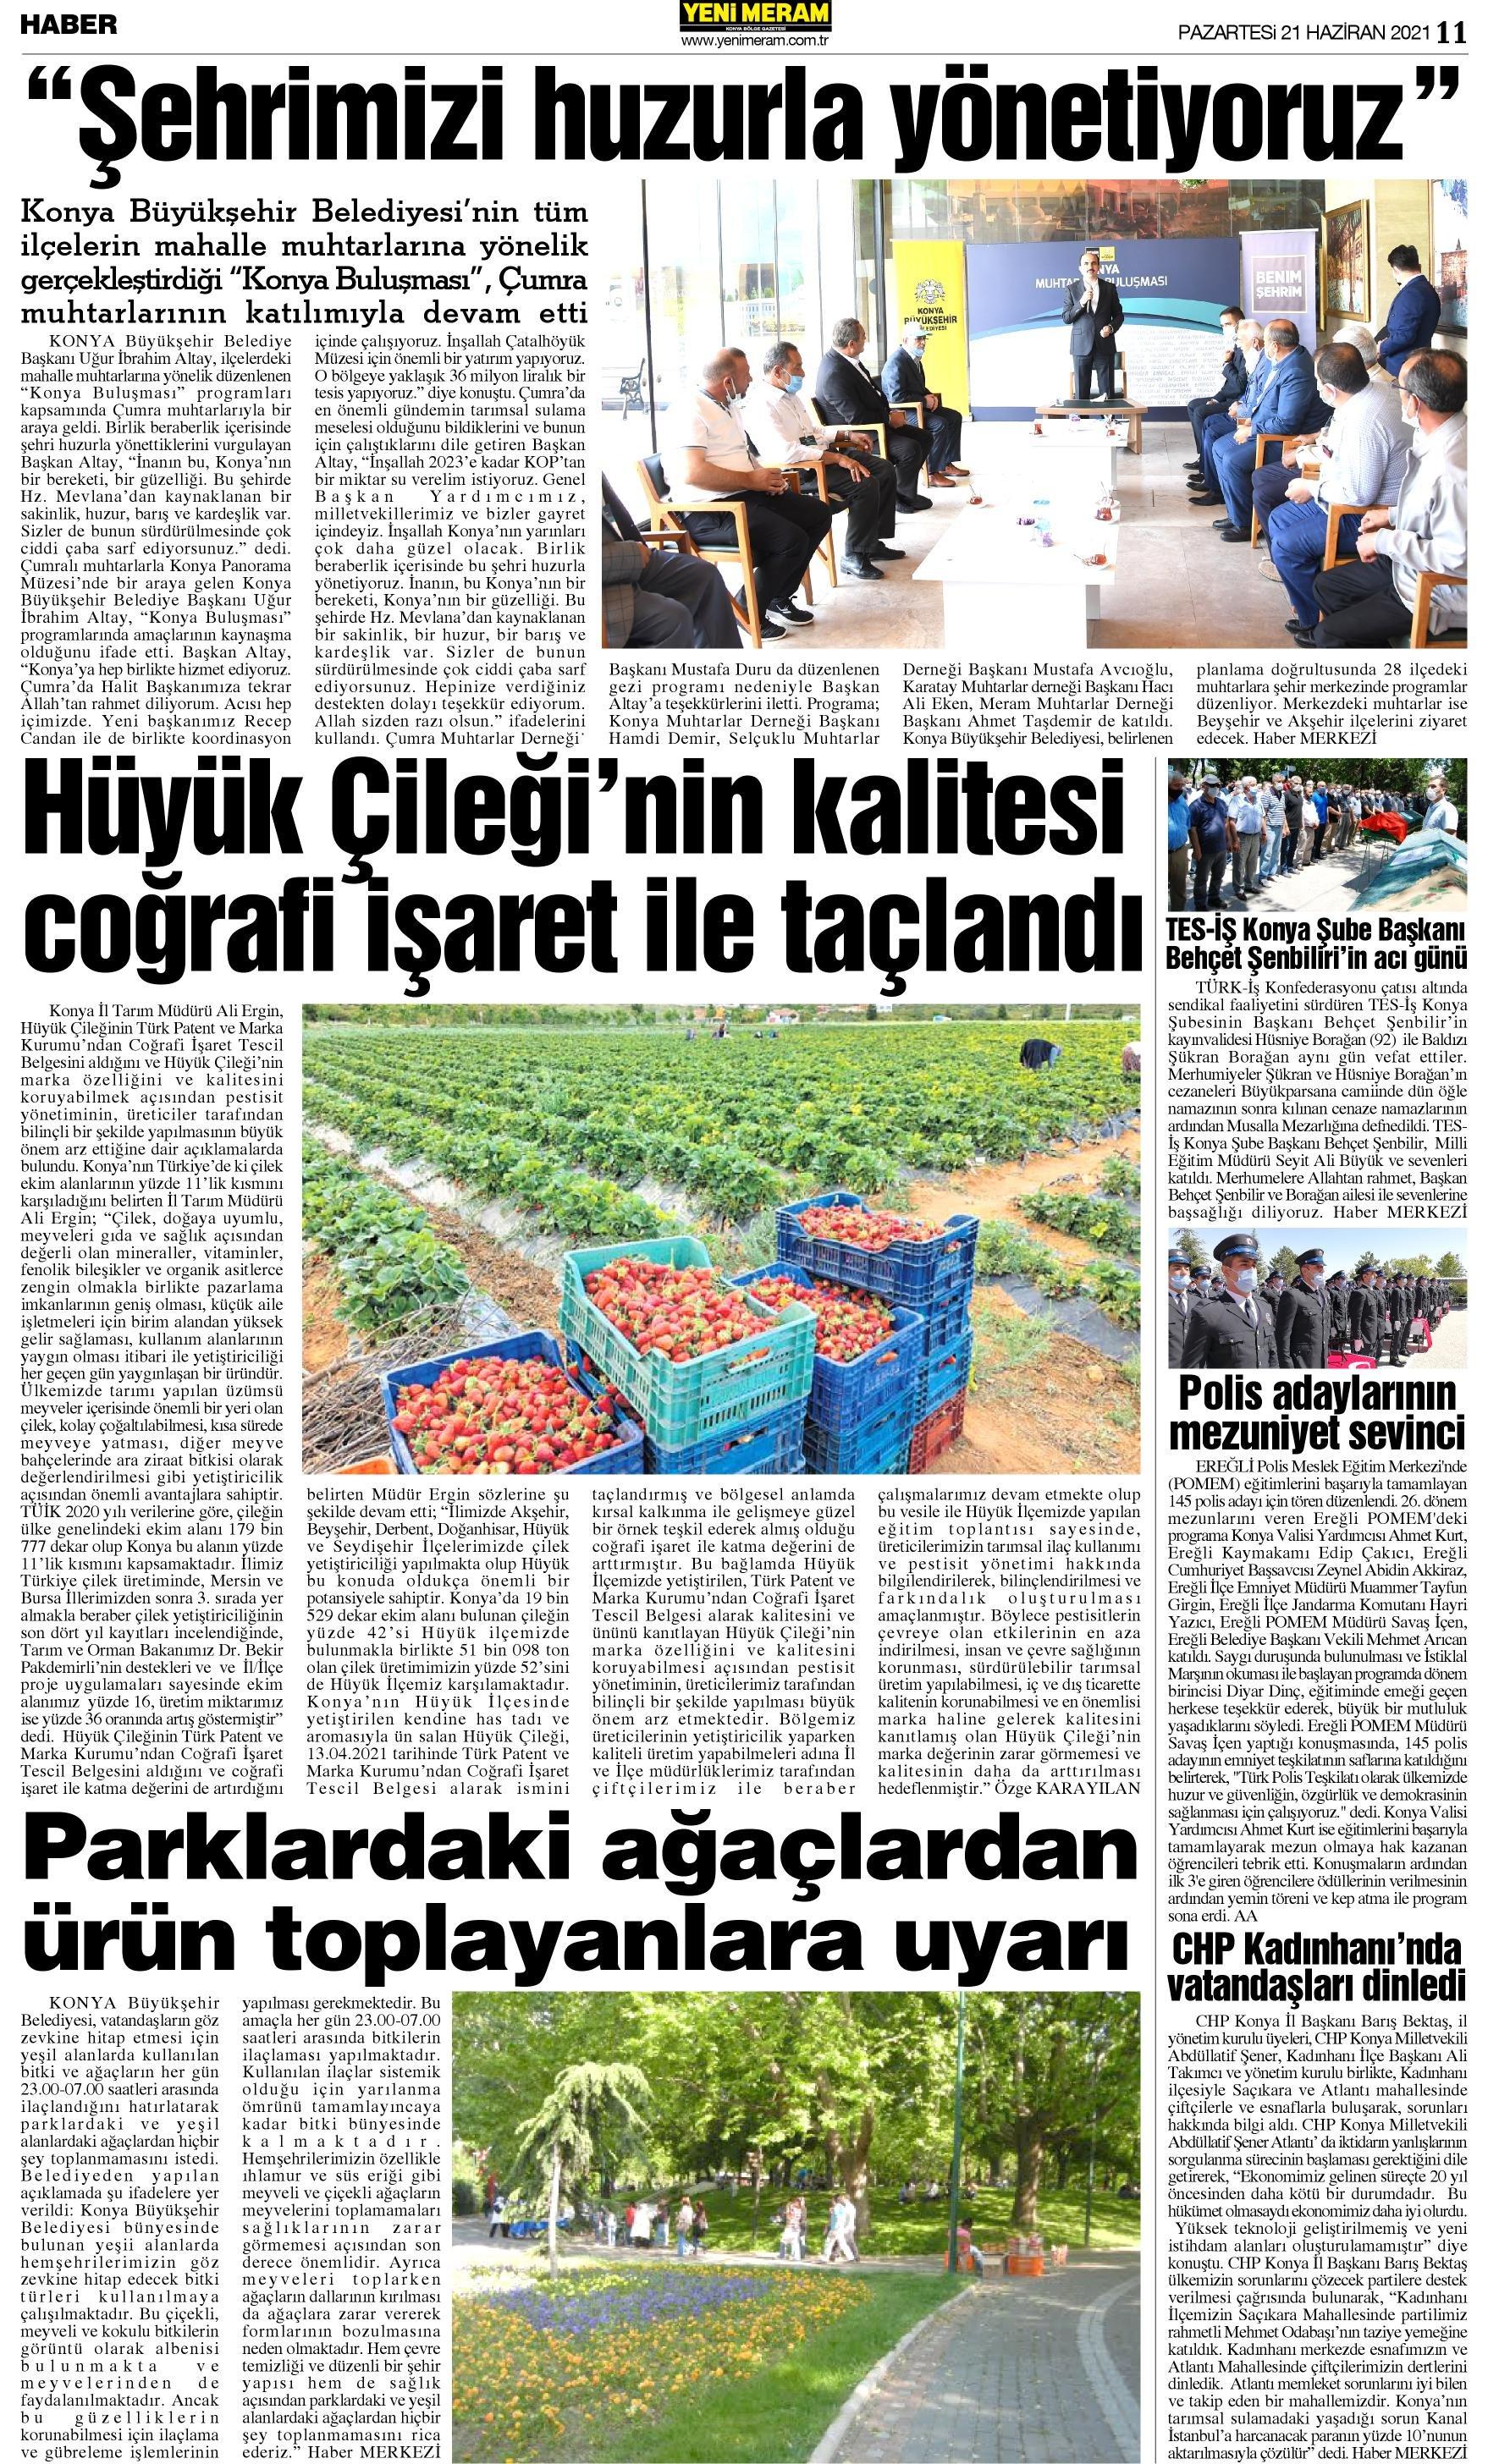 21 Haziran 2021 Yeni Meram Gazetesi